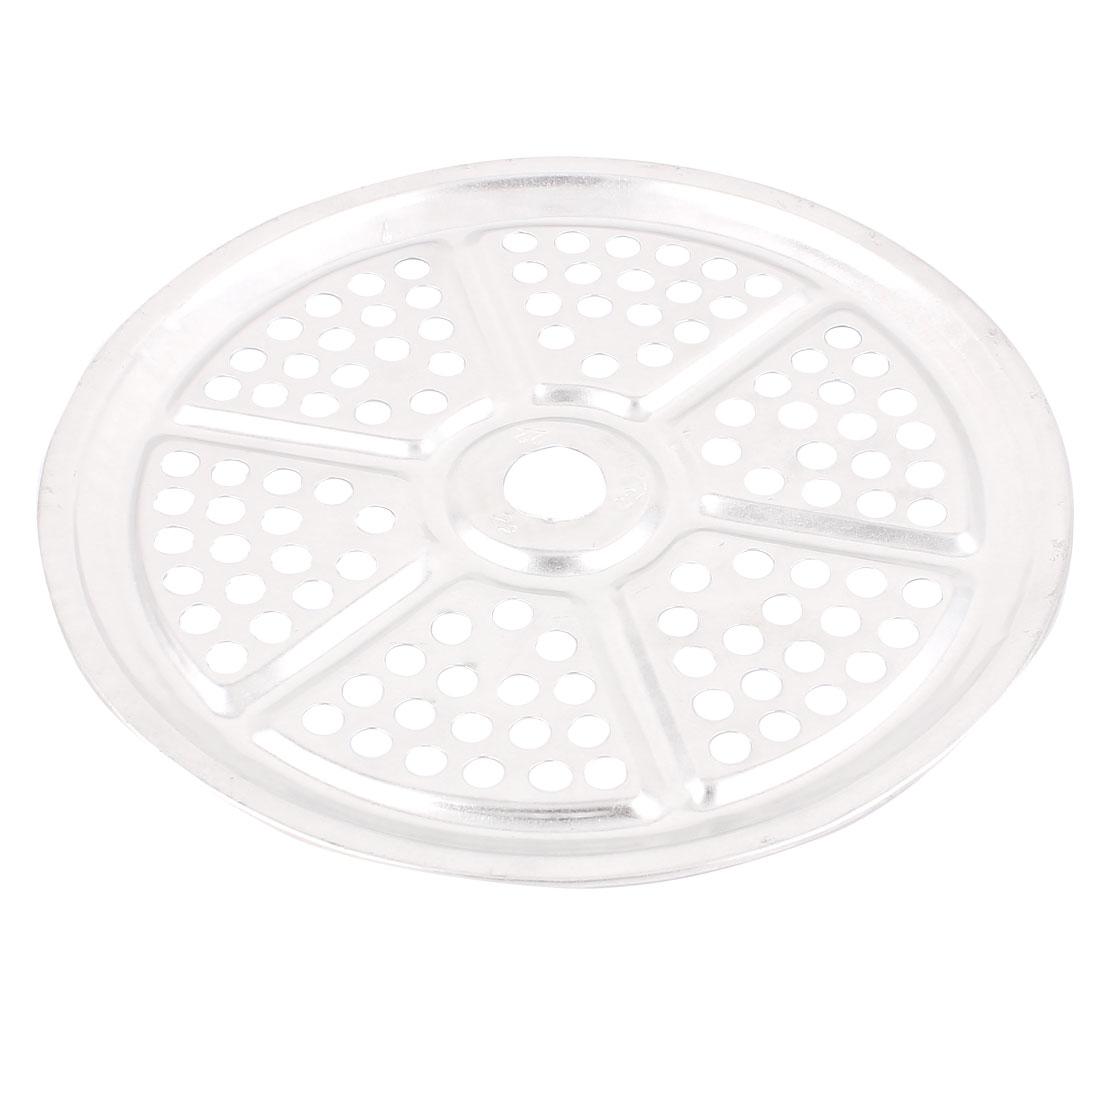 21cm Dia Aluminum Flour Bun Food Steaming Steamer Rack Insert Plate